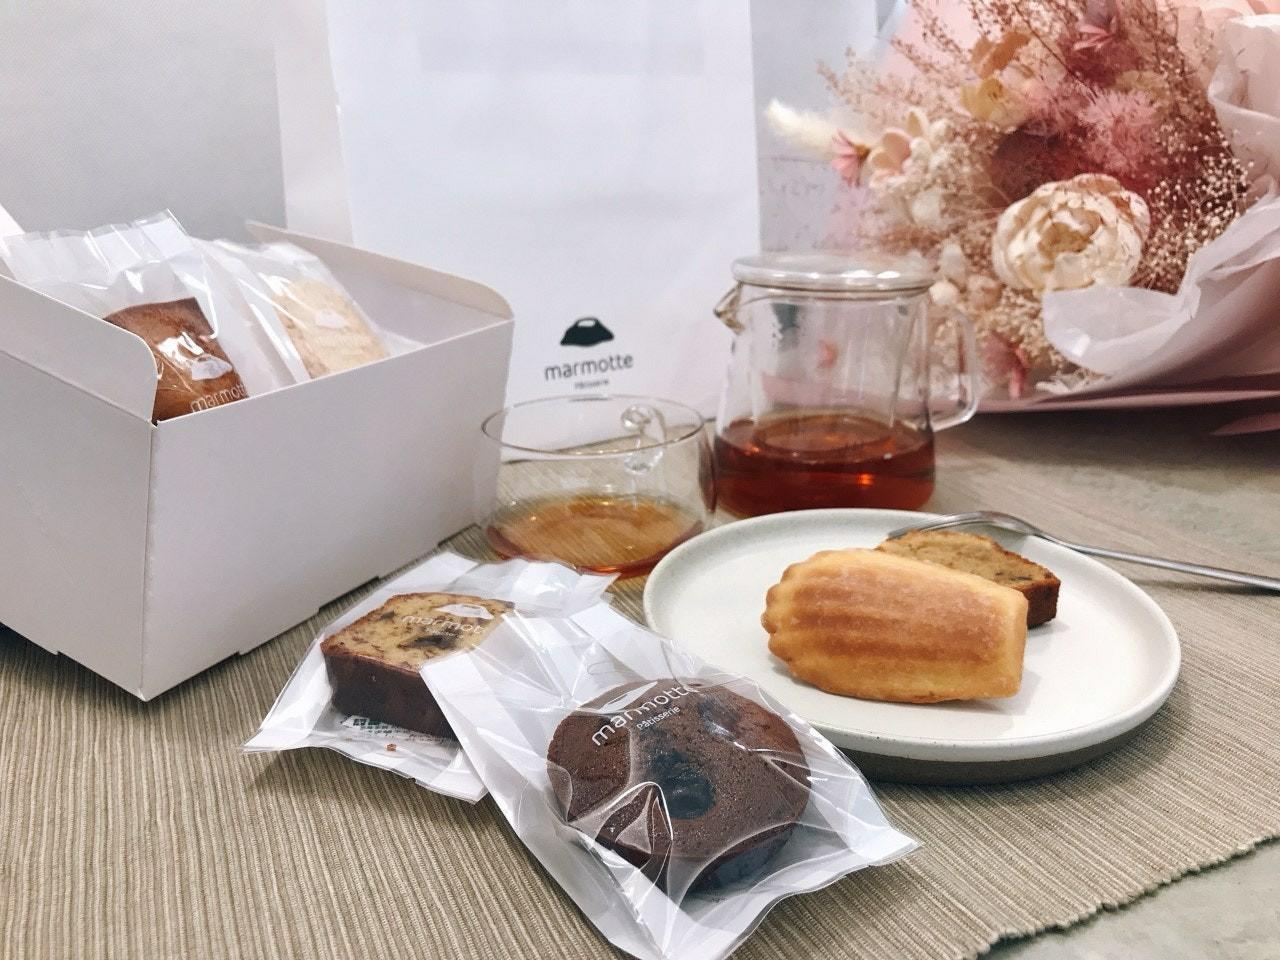 Pâtisserie marmotte 法式經典,瑪德蓮,費南雪,蘭姆葡萄磅蛋糕,花生馬卡龍,台中天團全明星備戰糧包,台中美食